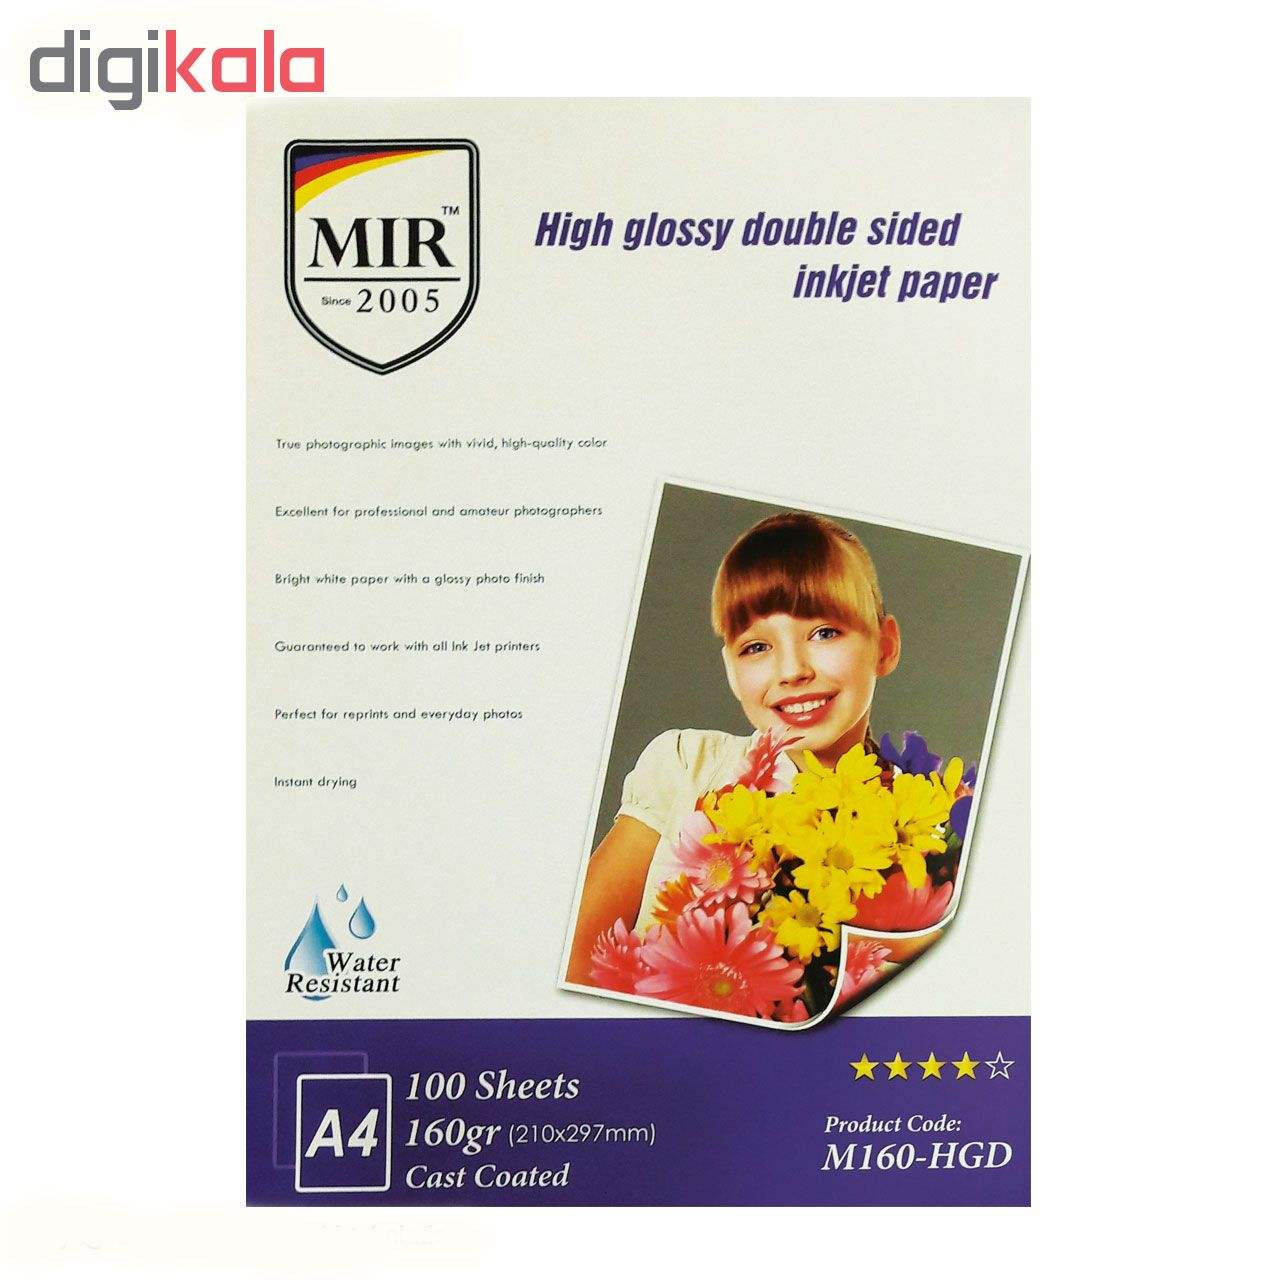 کاغذ چاپ عکس گلاسه میر مدل M160-HGD سایز A4 بسته 100 عددی main 1 1